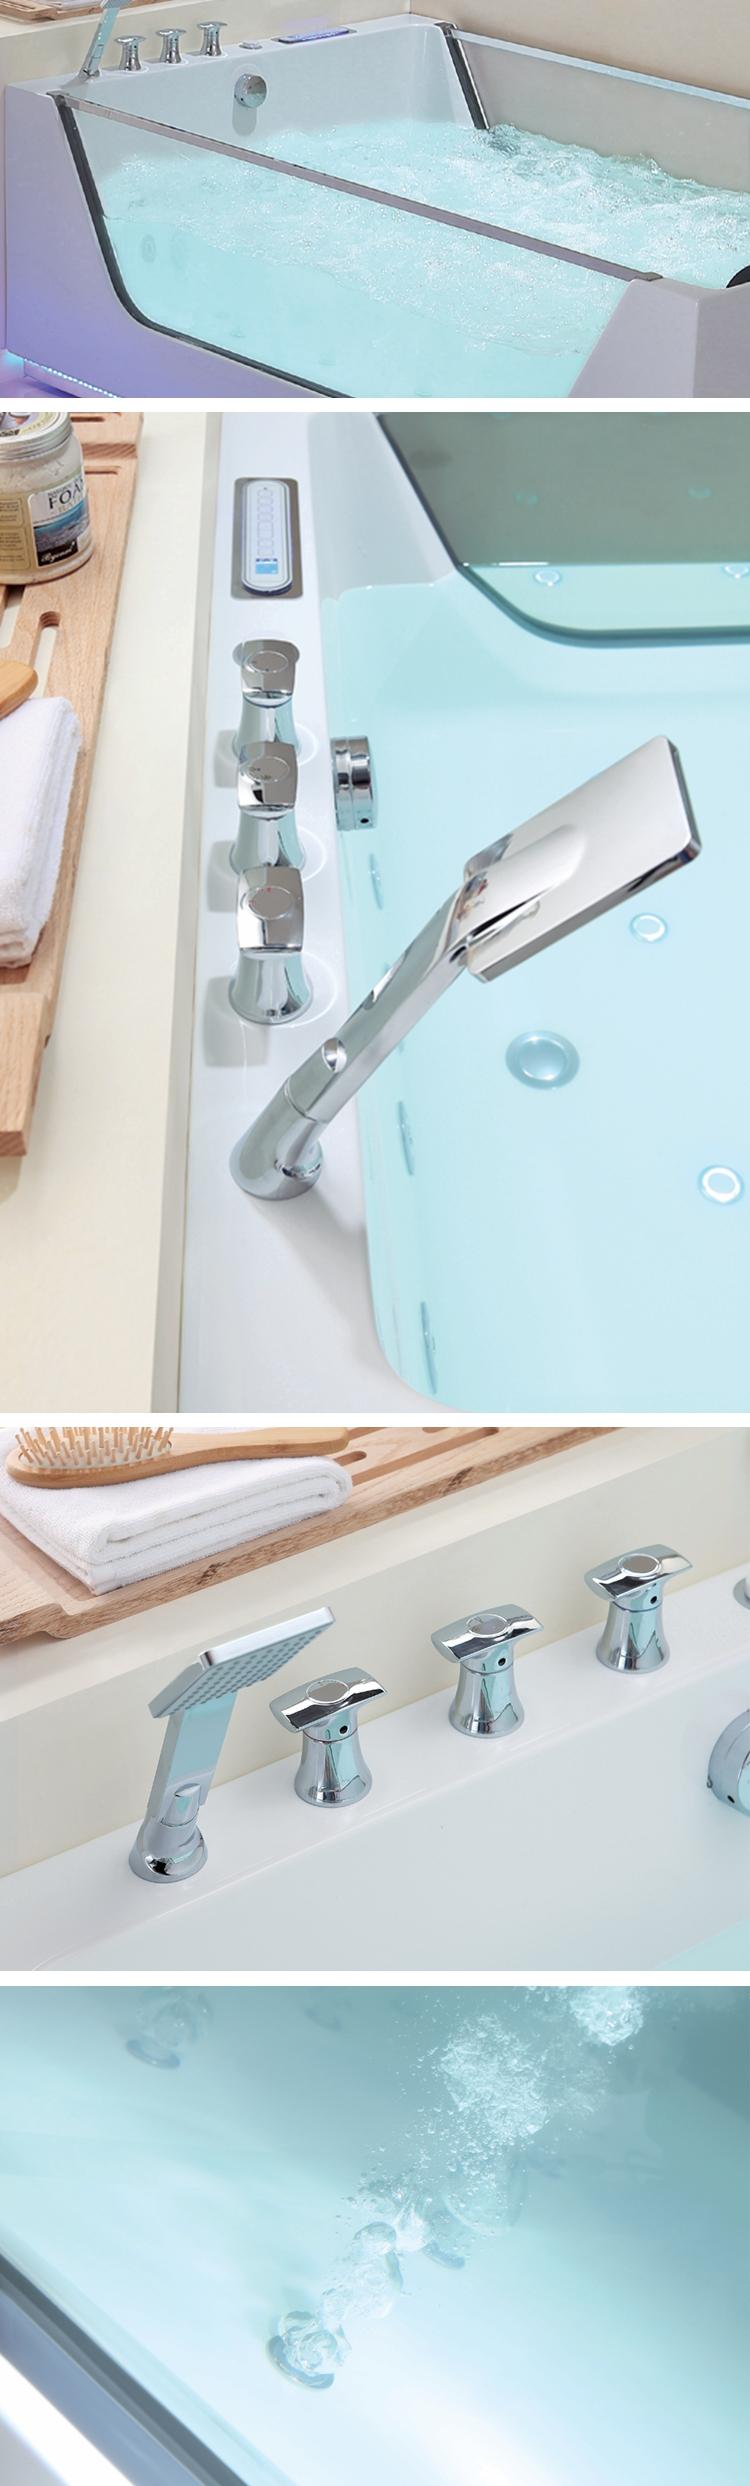 Badewanne moderne Kunstbäder, Whirlpool-Whirlpool-Massagebadewanne